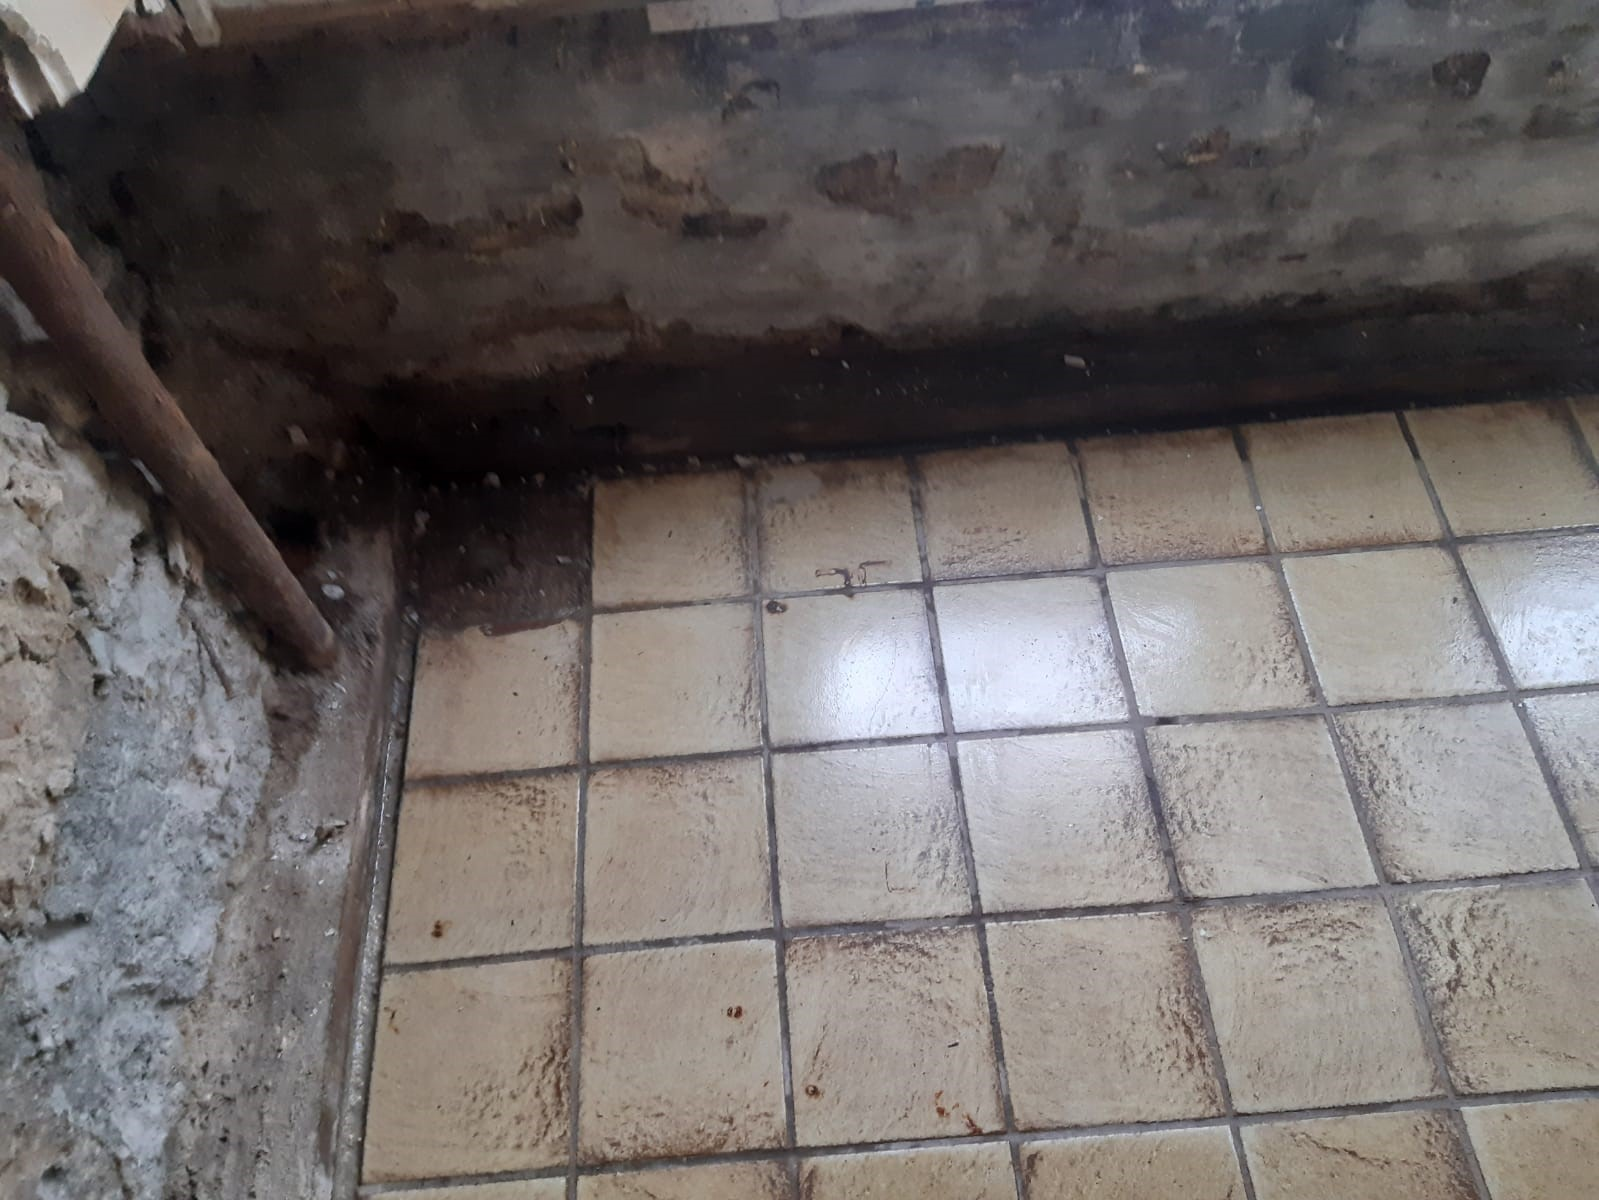 project Dry Works vochtproblematiek, lekkage, injecteren, afbikken, waterdicht pleistersysteem